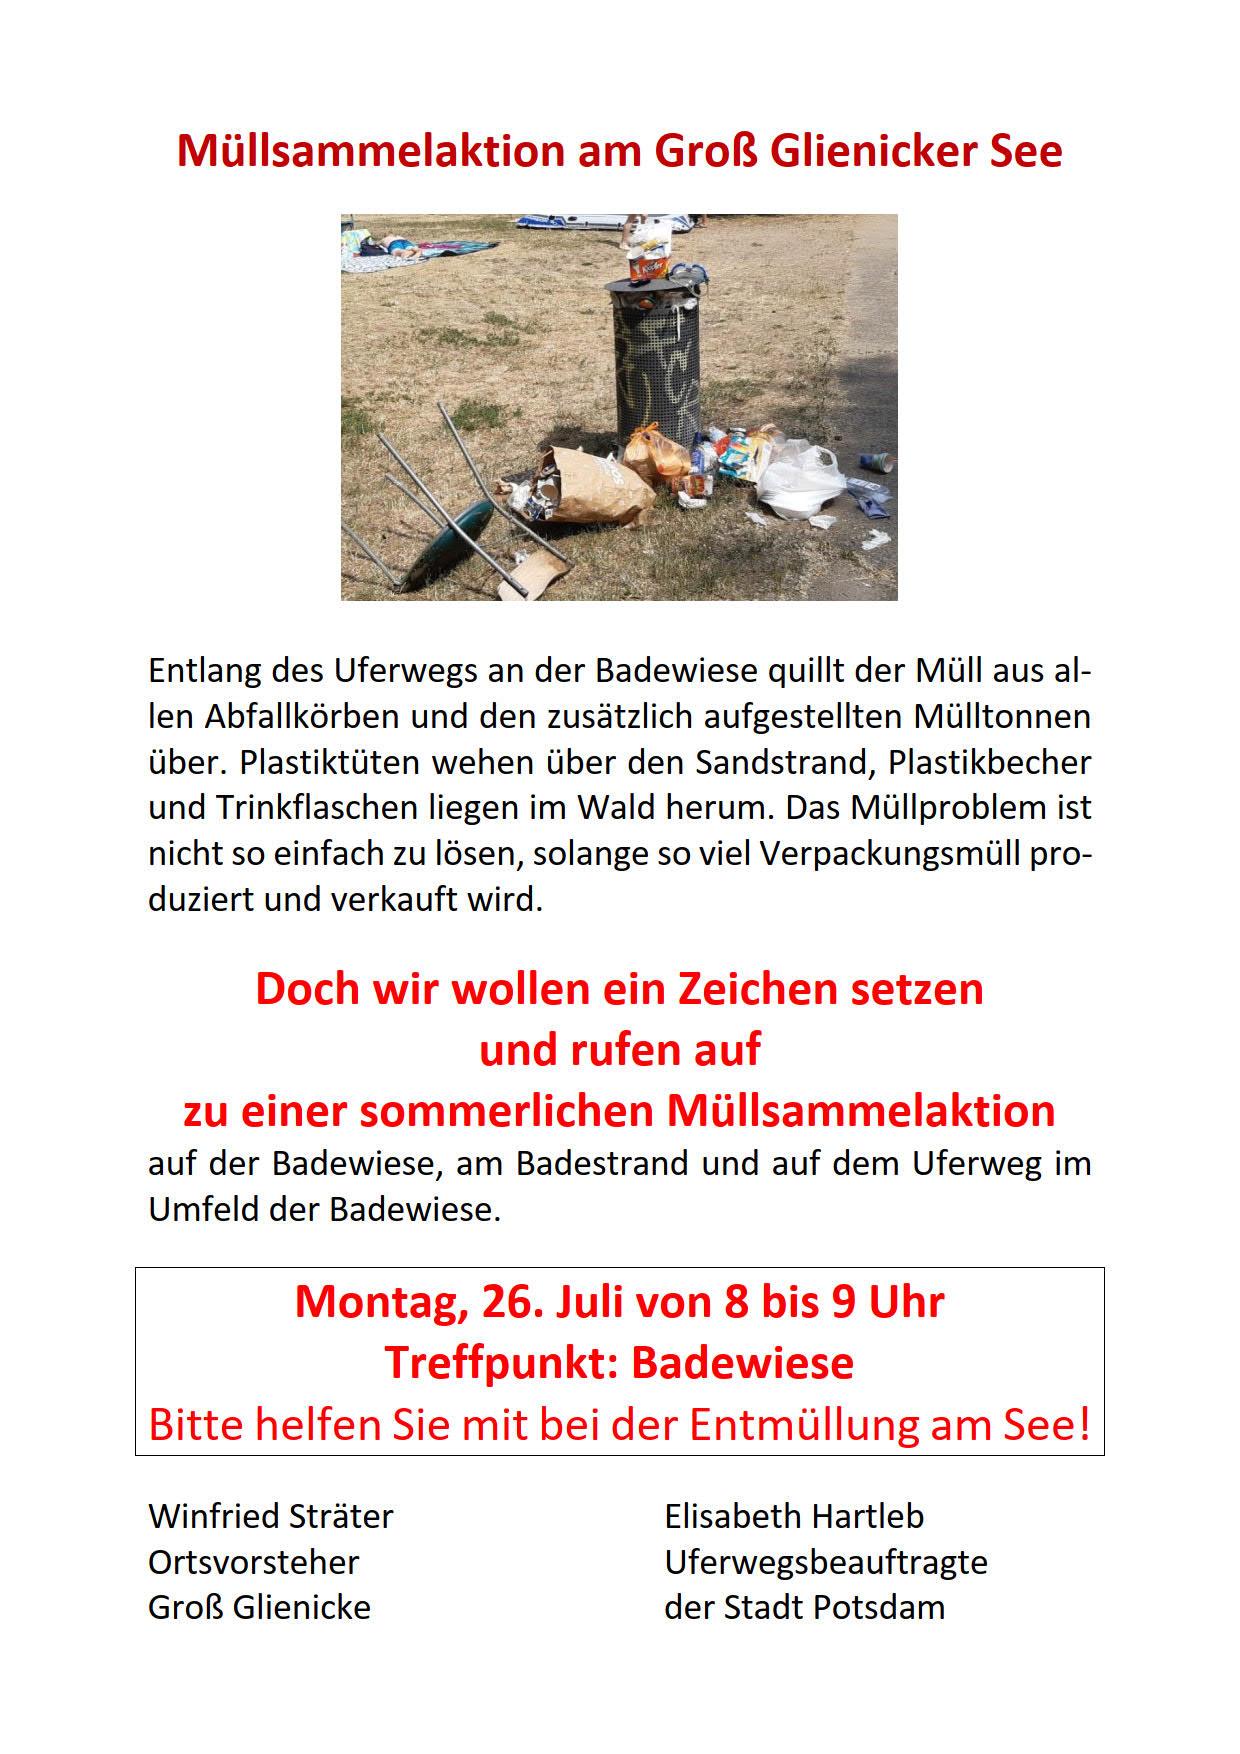 Müllsammelaktion Groß Glienicker See 26.07.2021